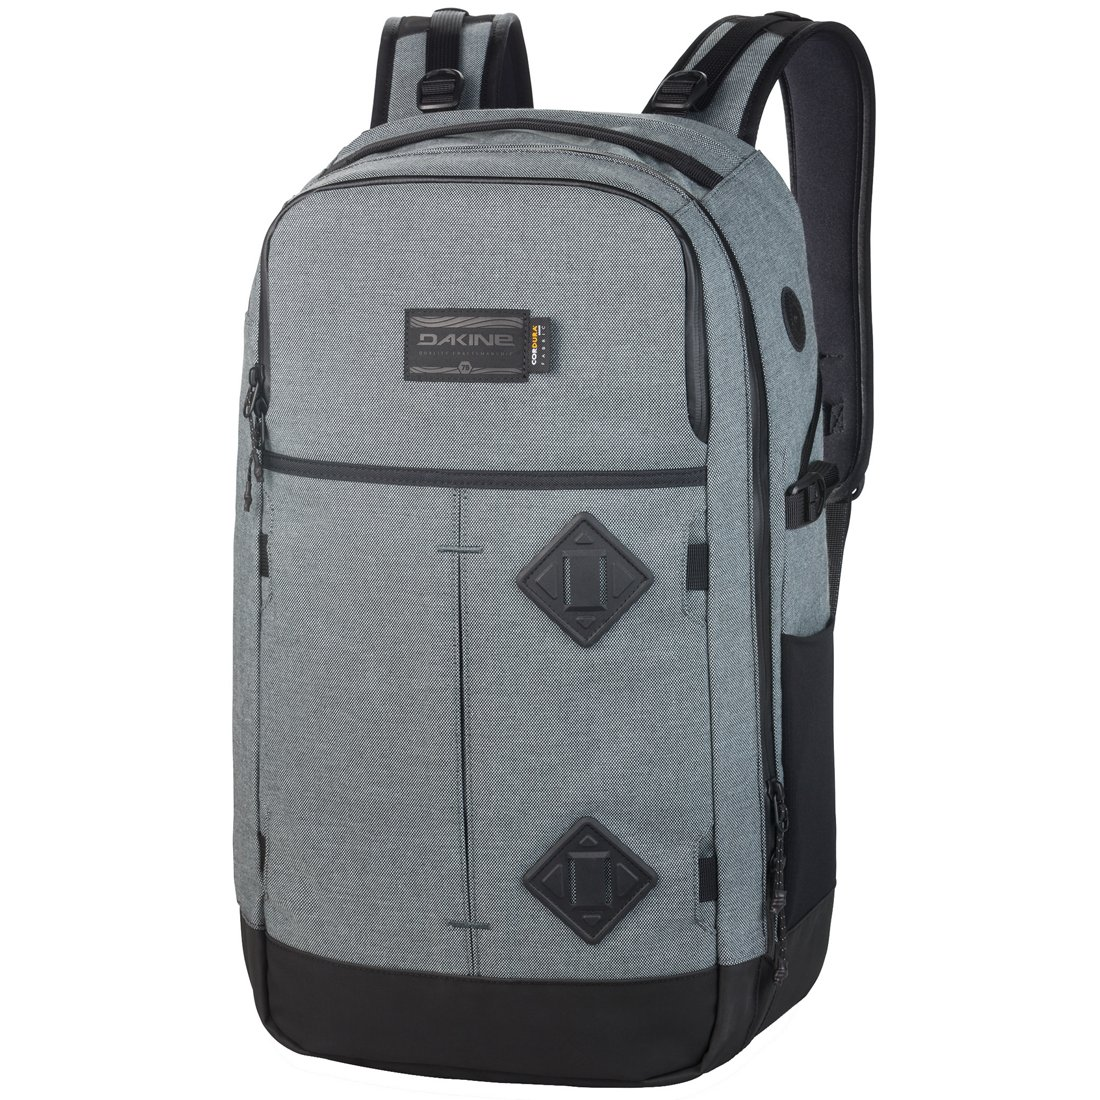 9c8cdb341c836 Dakine Packs   Bags Split Adventure Rucksack 55 cm - koffer-direkt.de